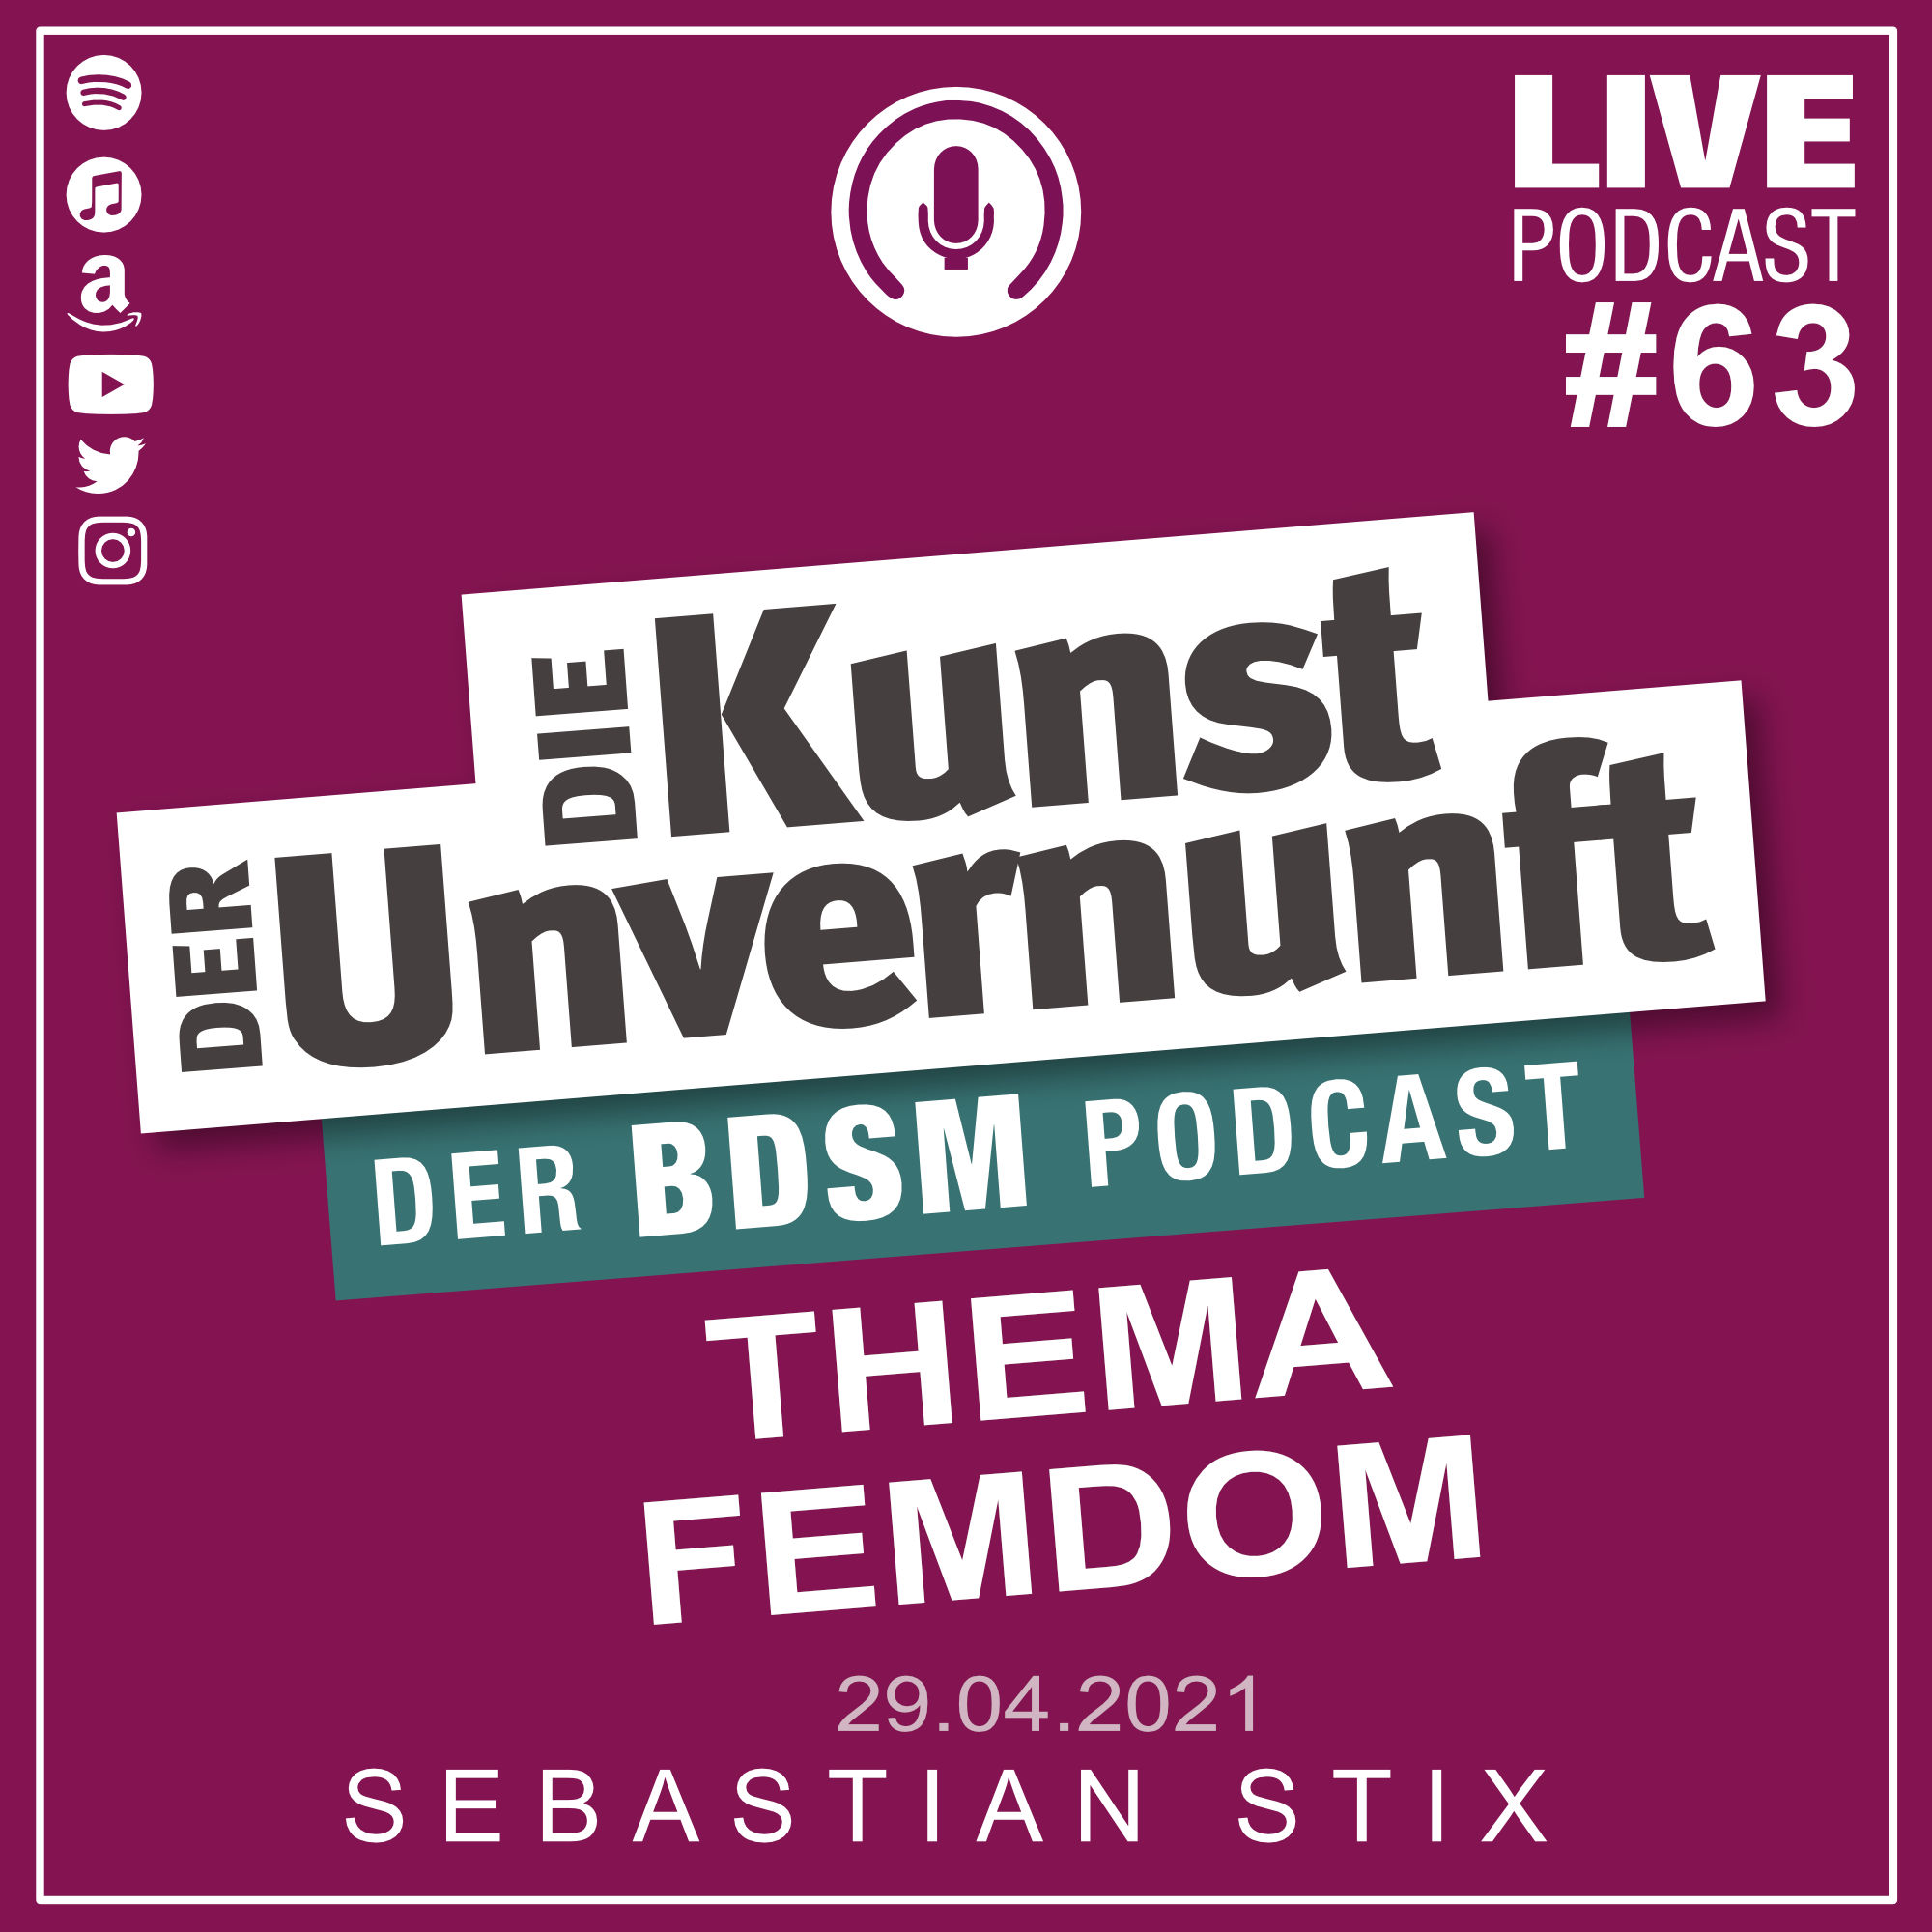 Unvernunft Live 29.04.2021 - Thema FEMDOM